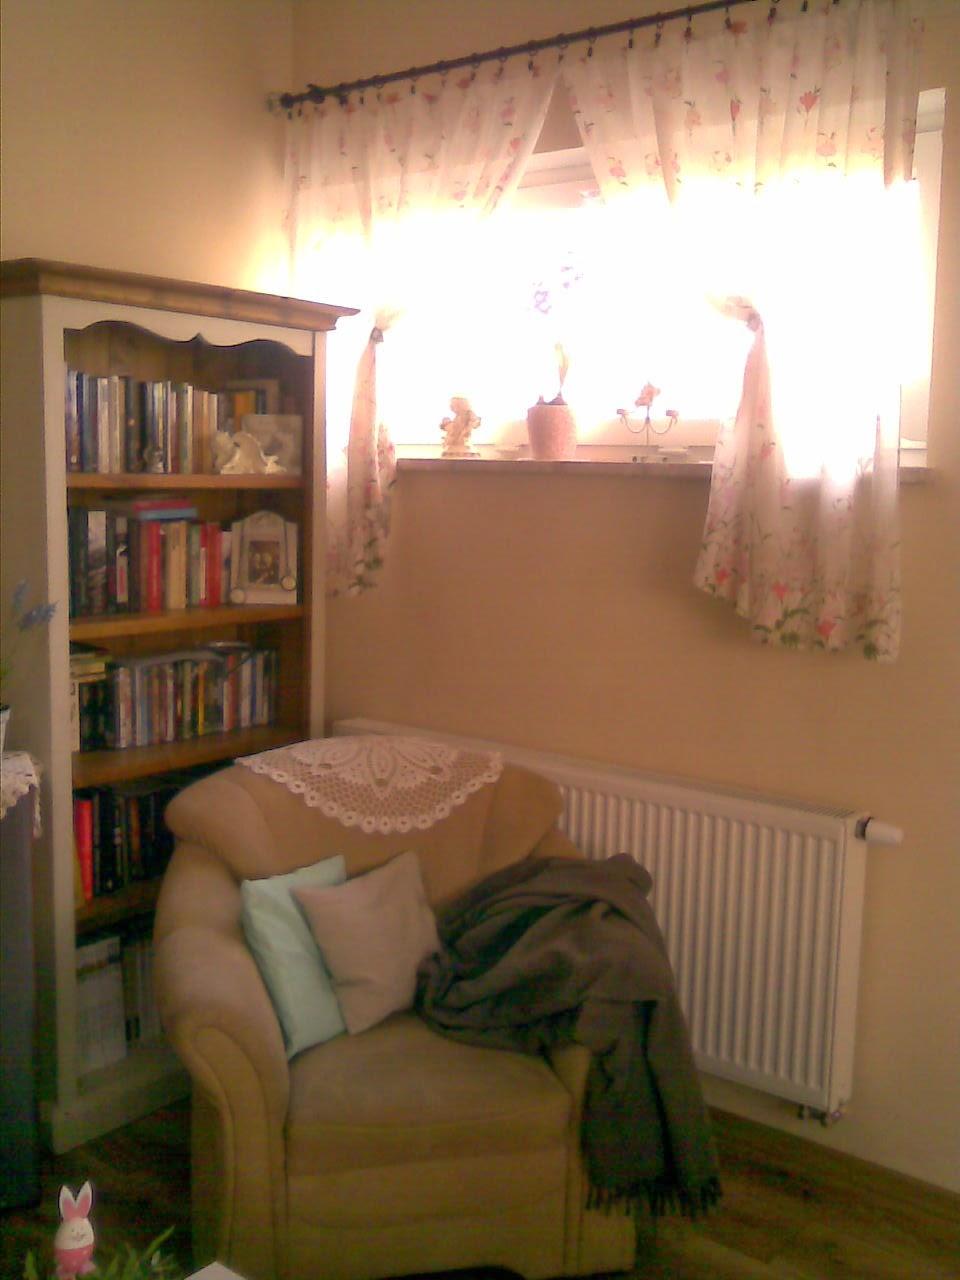 Salon i kącik z książkami